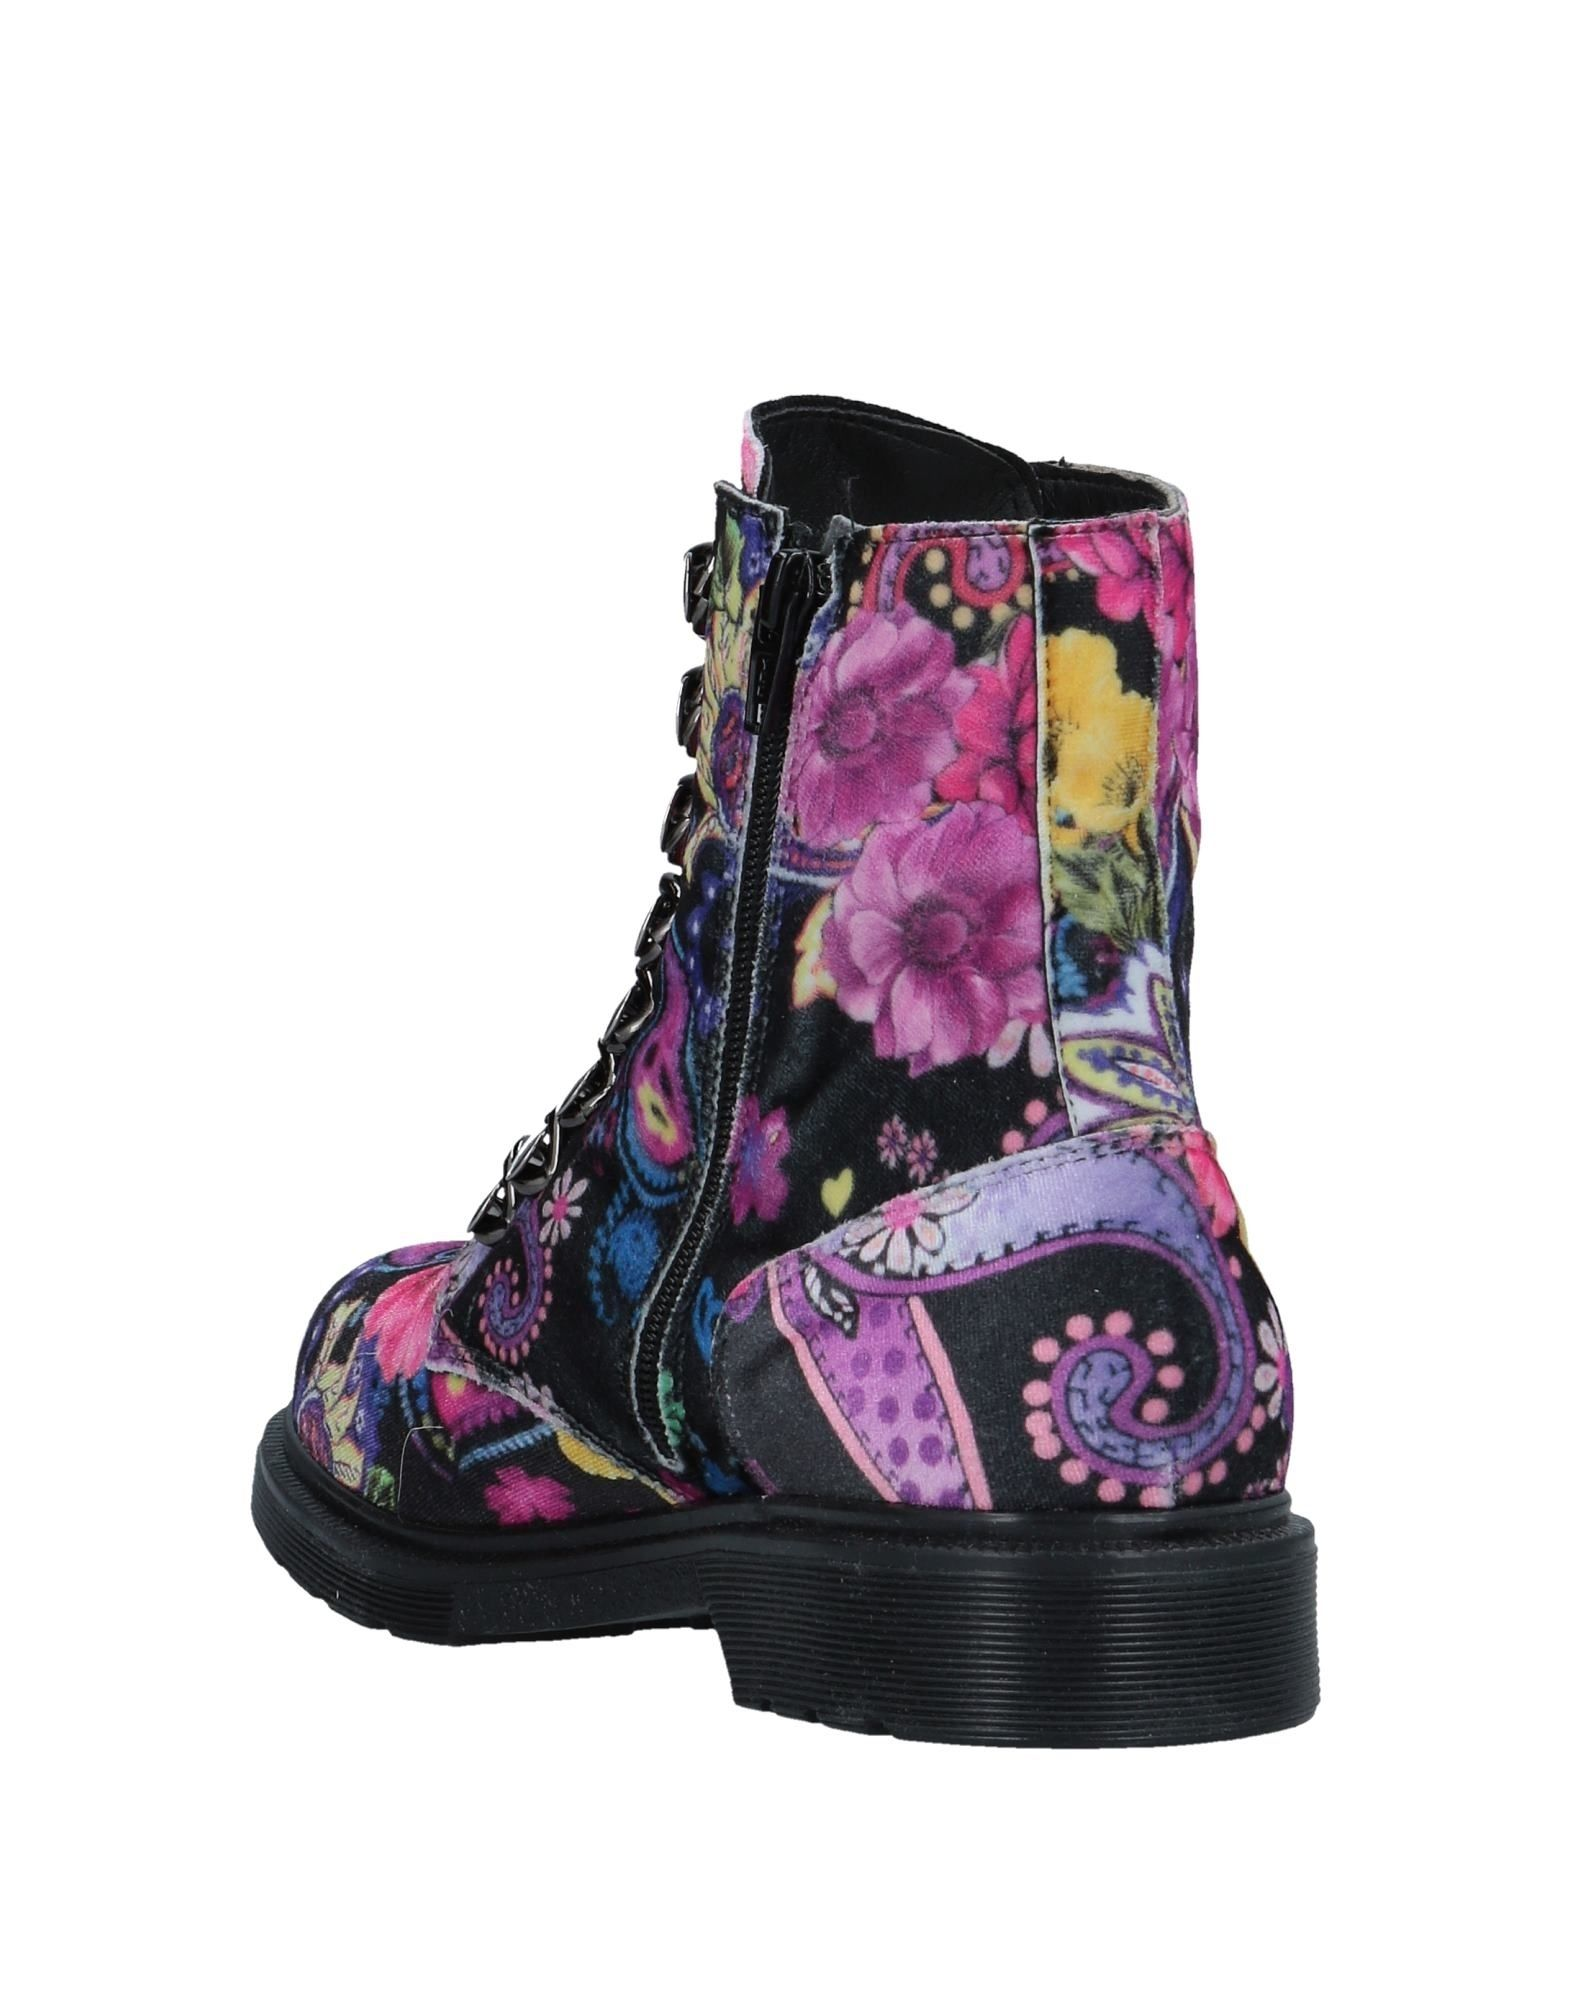 Unlace Stiefelette Damen  11522829MA Schuhe Gute Qualität beliebte Schuhe 11522829MA 2544a9